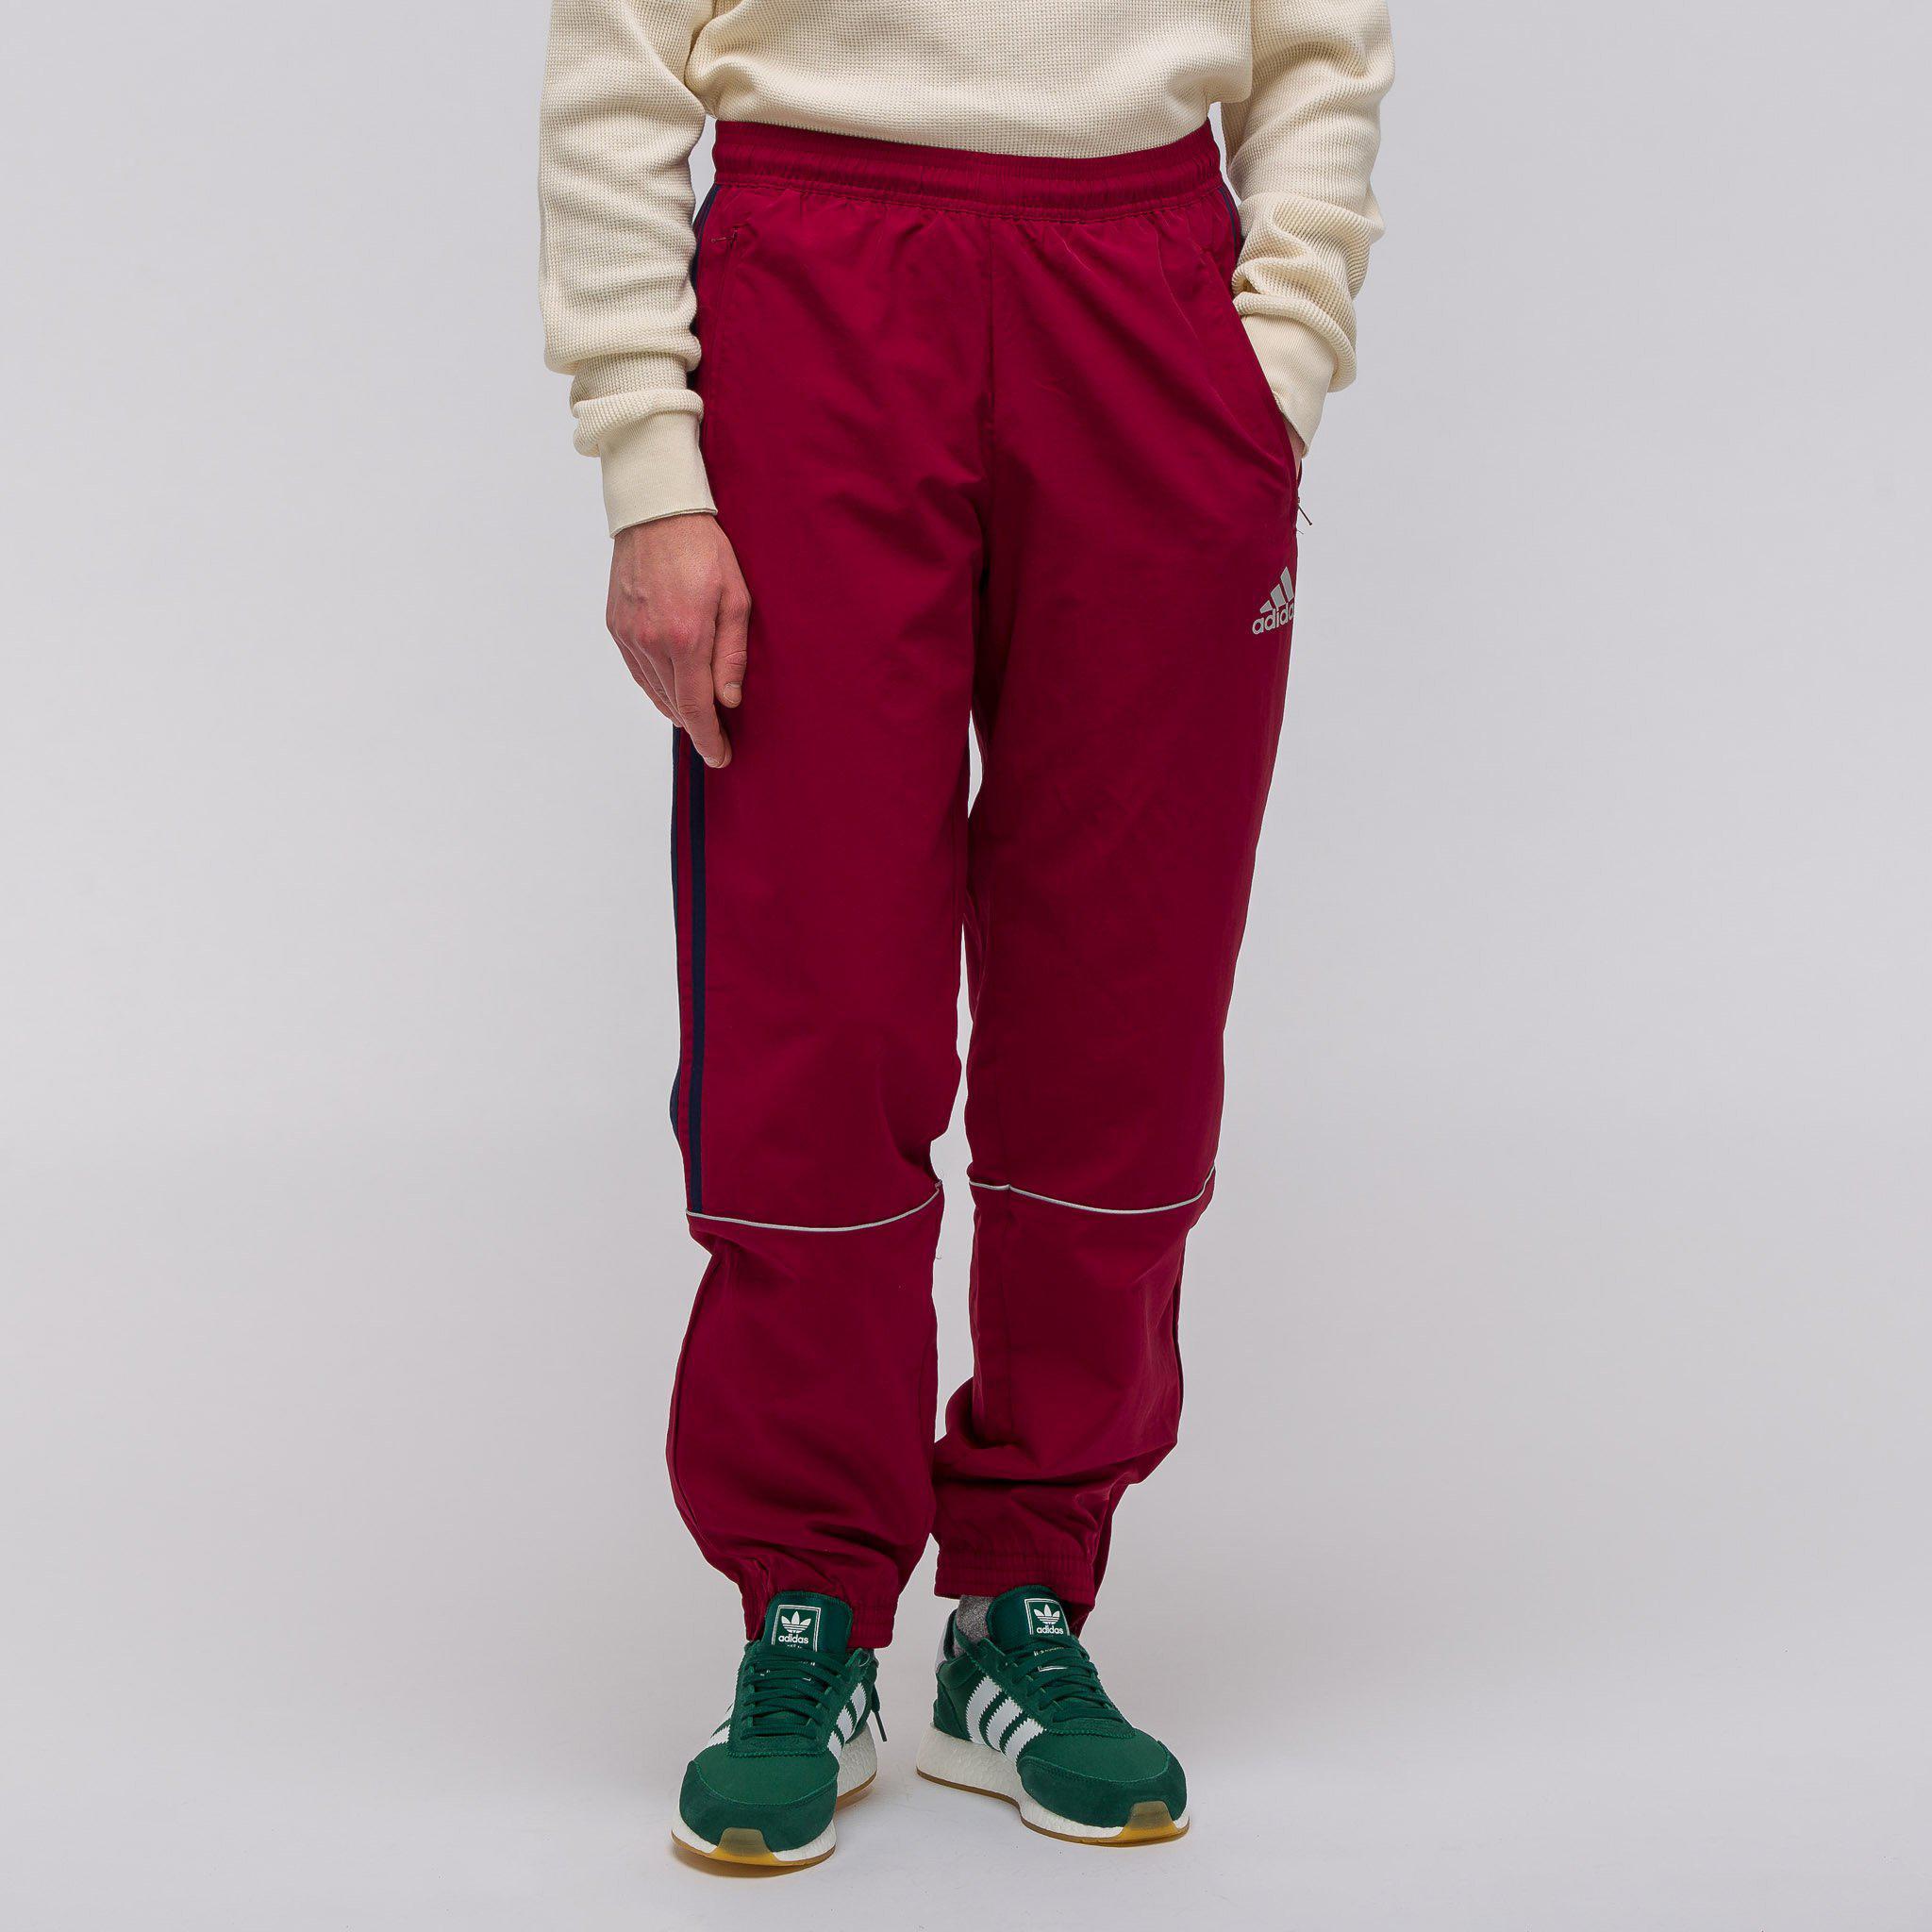 Lyst Gosha rubchinskiy x Adidas TRACK PANT en Borgoña en rojo para hombres